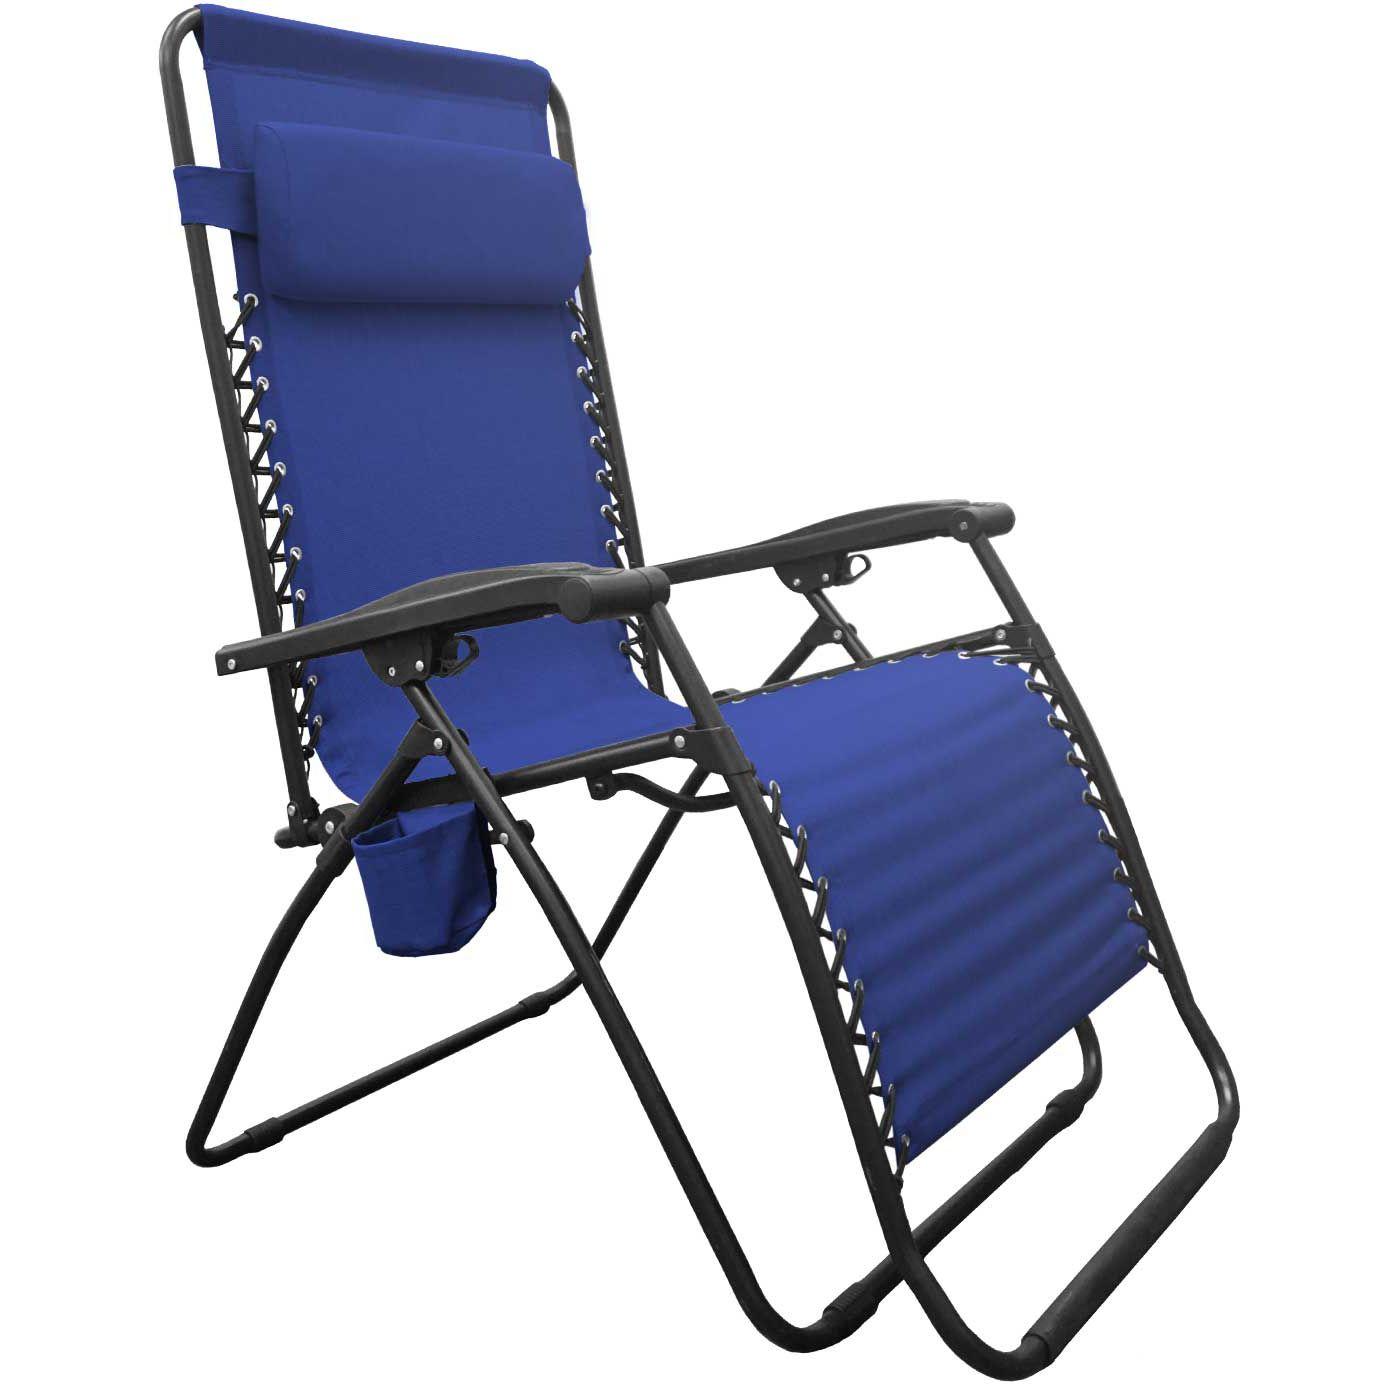 Caravan Sports Infinity Big Boy Zero Gravity Chair